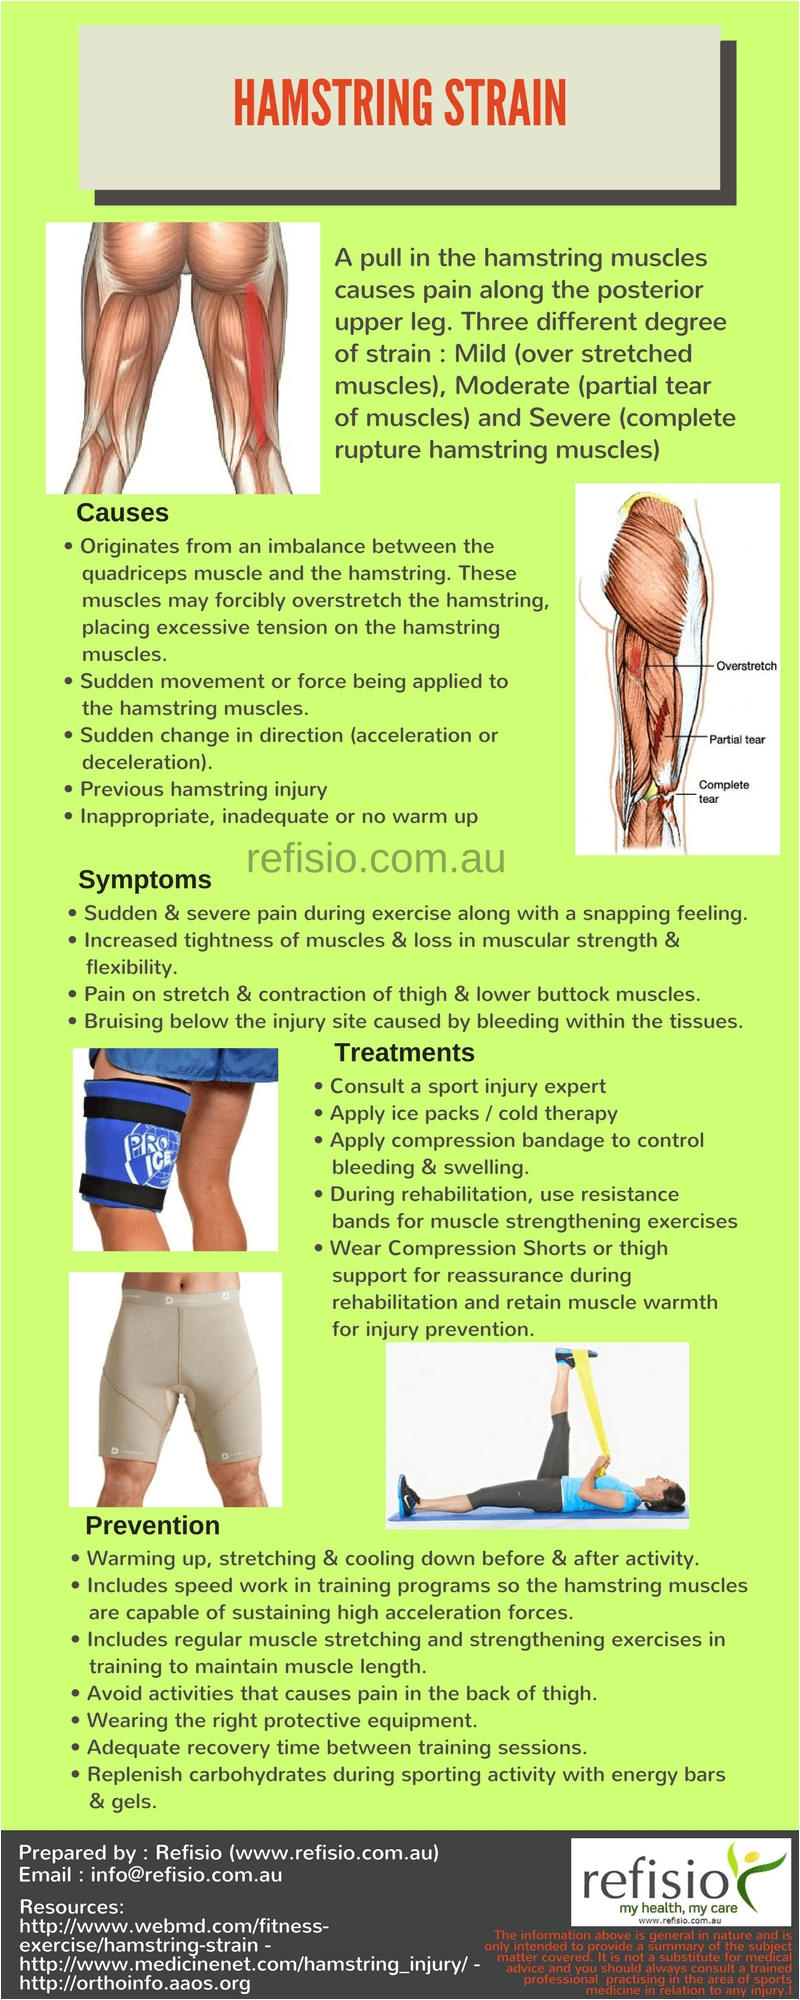 hamstring strain causes symptoms treatments prevention sportsinjuries hamstring injury treatment